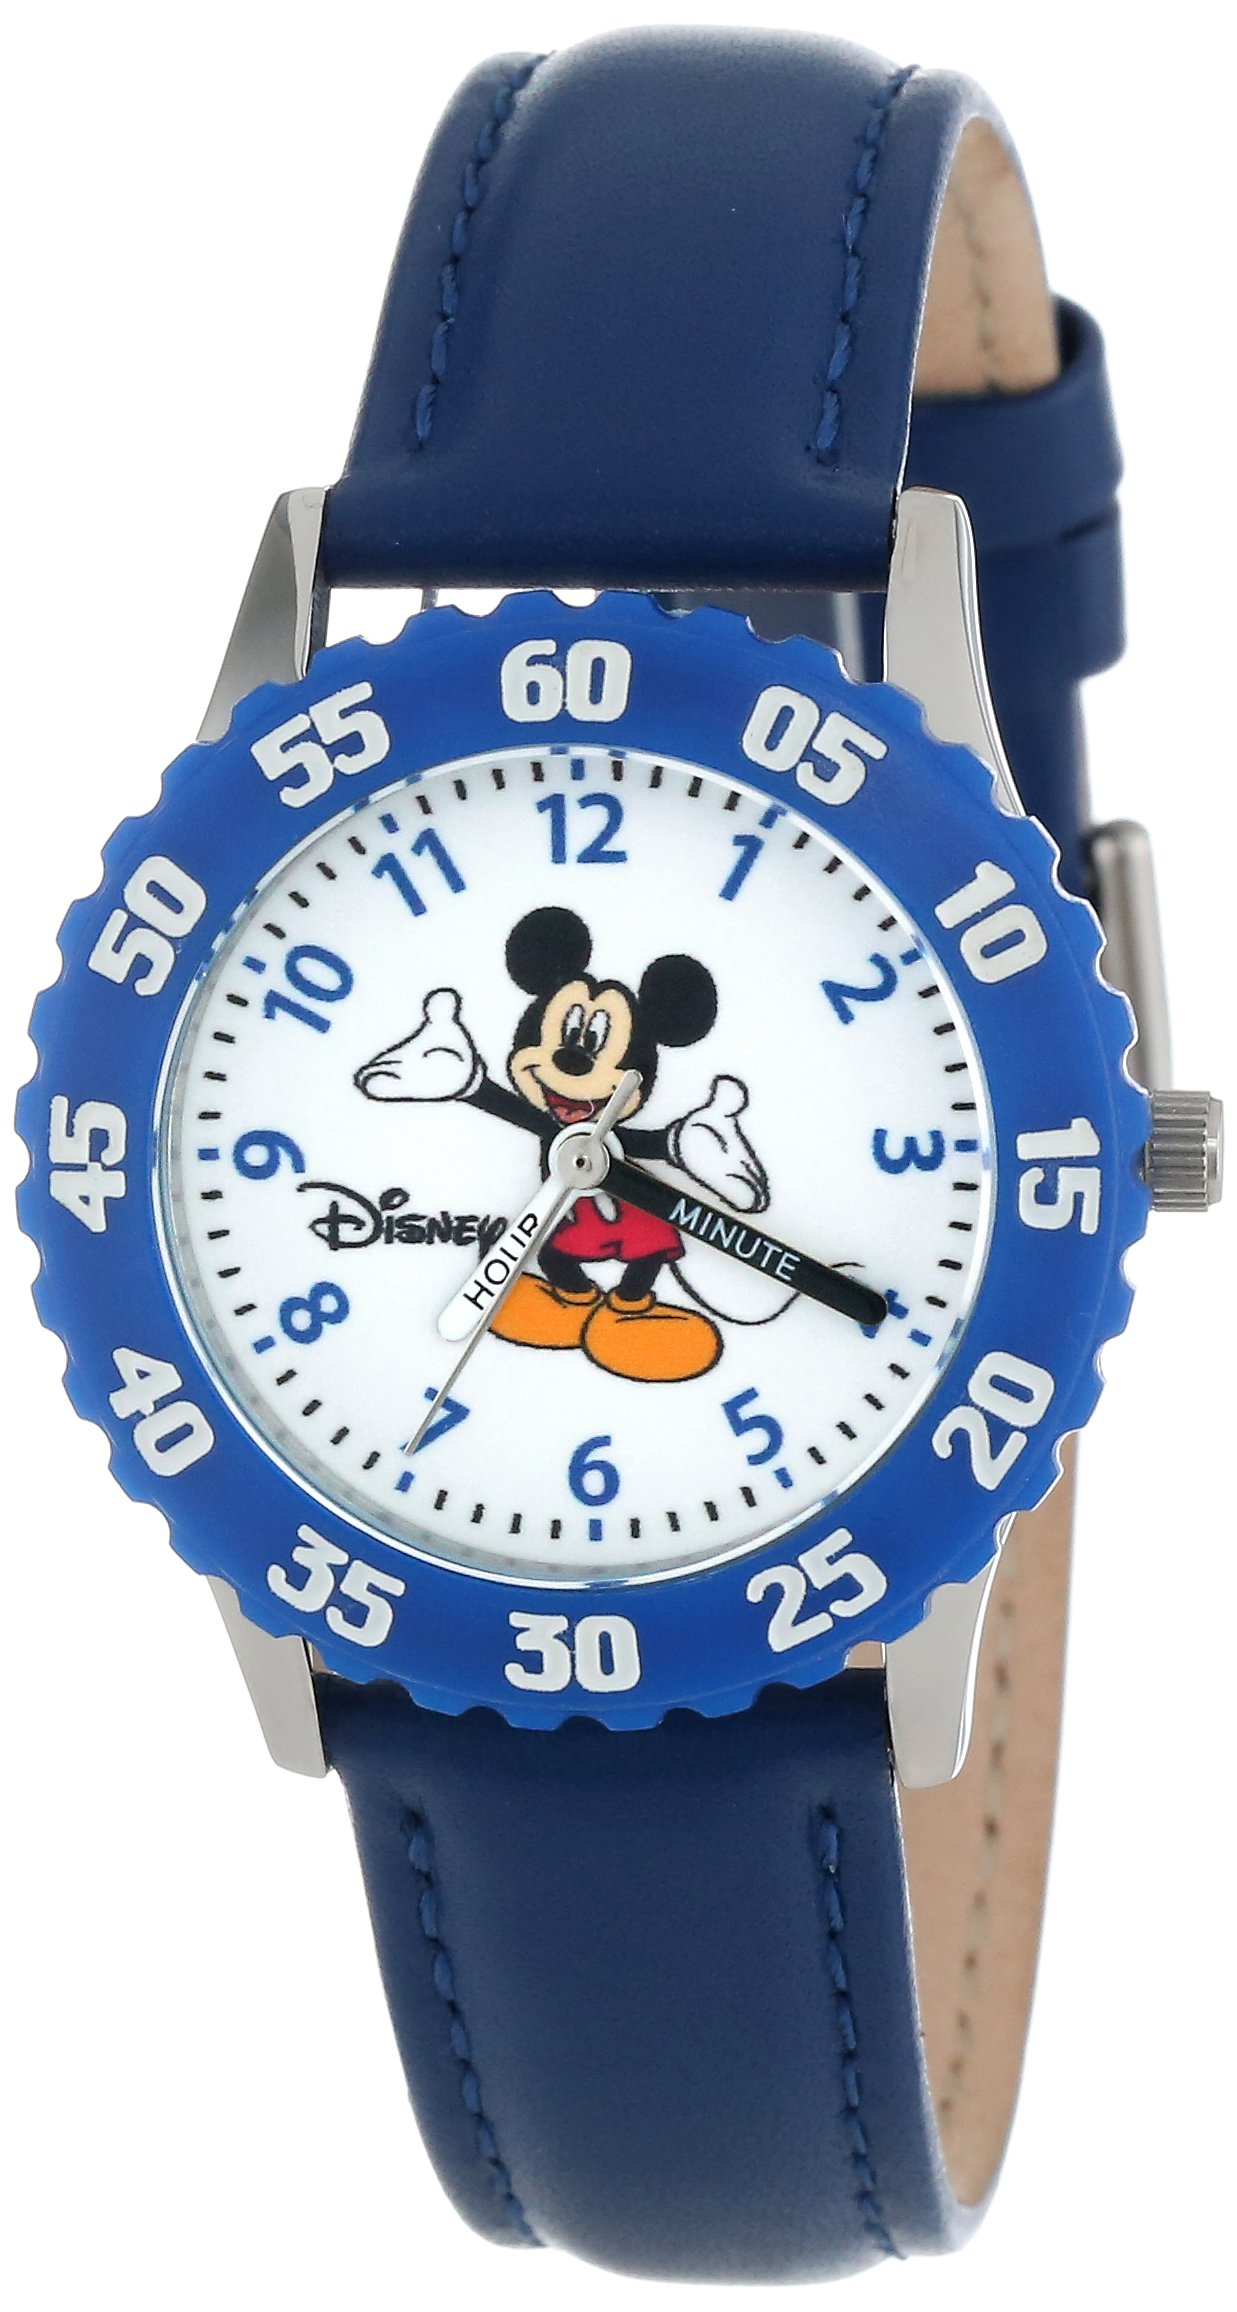 Disney Kids' W000005 Mickey Mouse Stainless Steel Time Teacher Watch by Disney